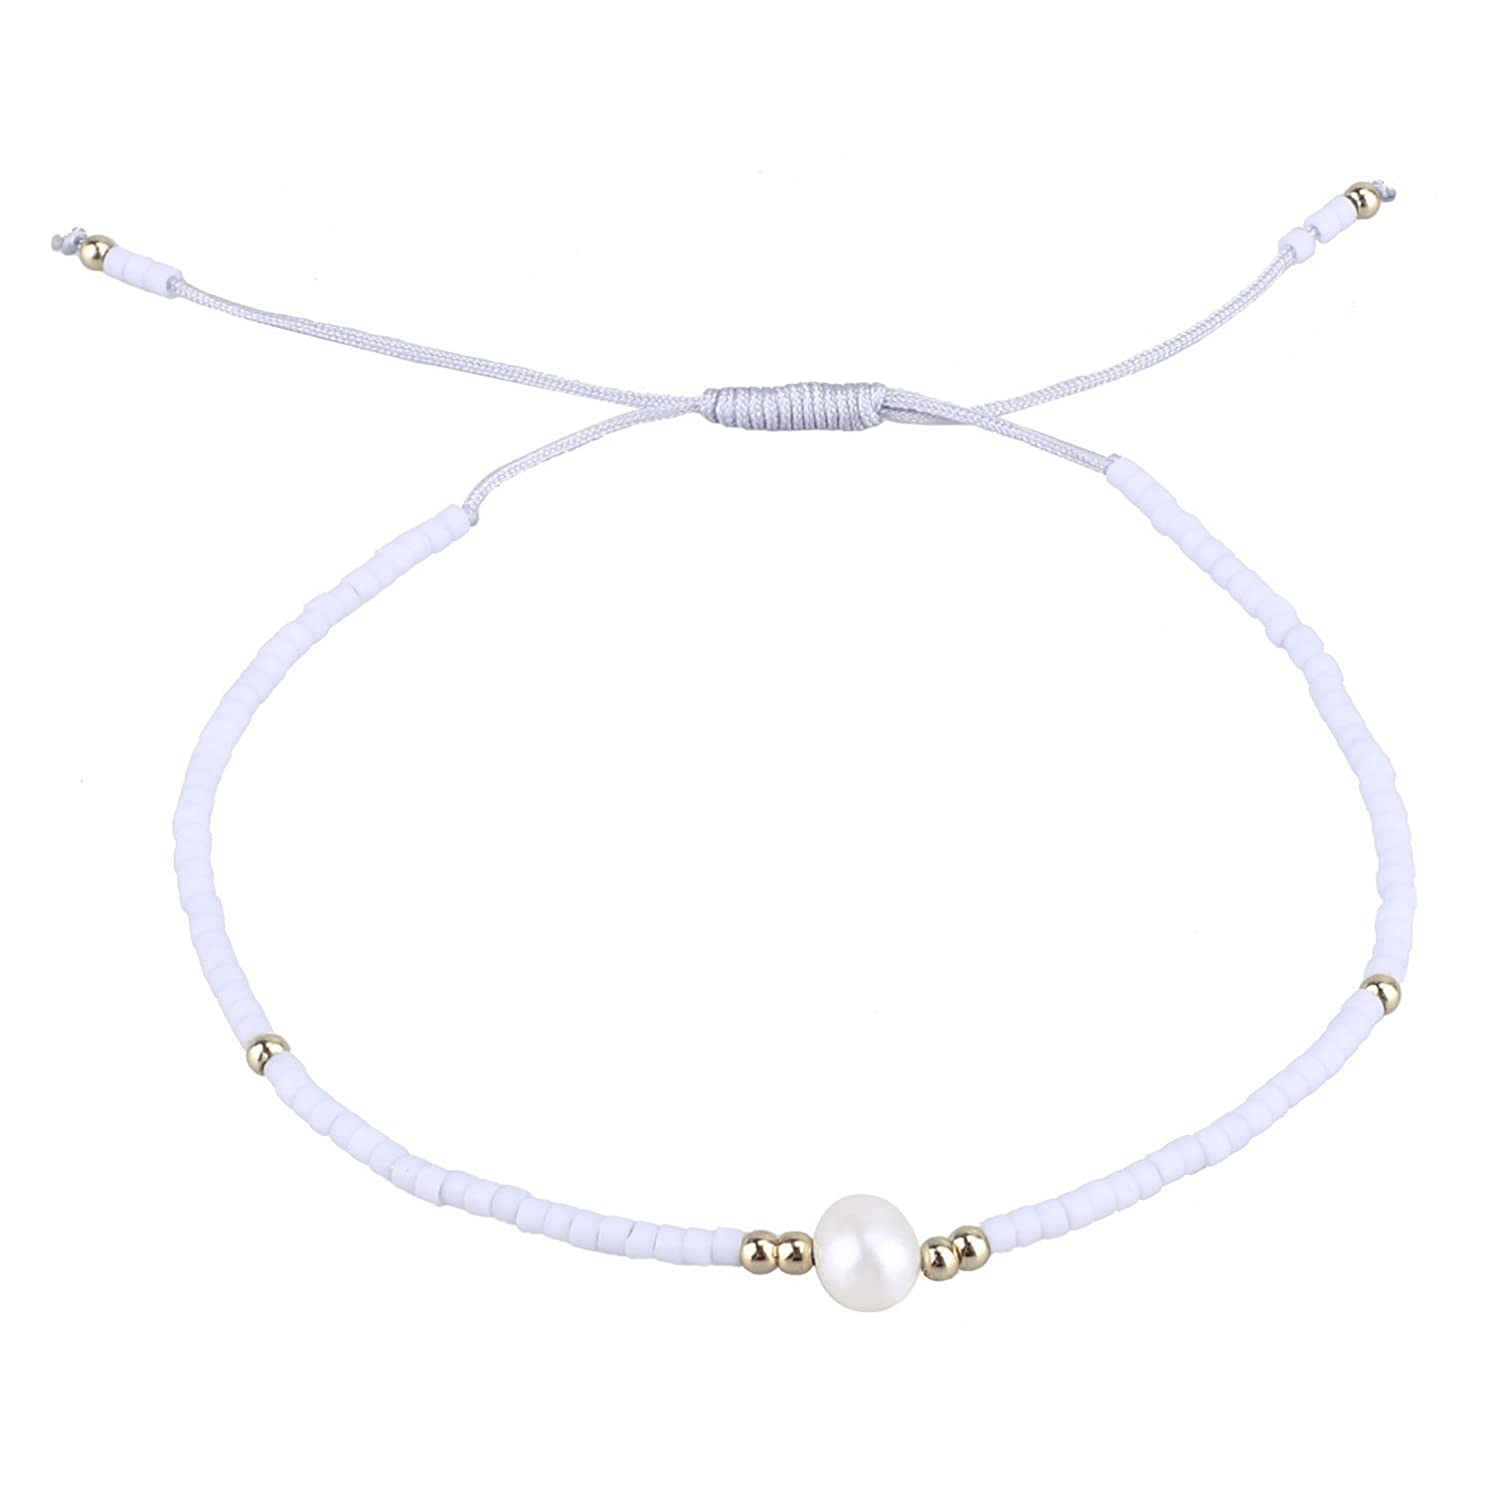 C·QUAN CHI Woven Strand Bracelet Women String Natural Pearl Sead Beaded Wax Rope Handmade Braided Adjustable Bracelet Women Gifts